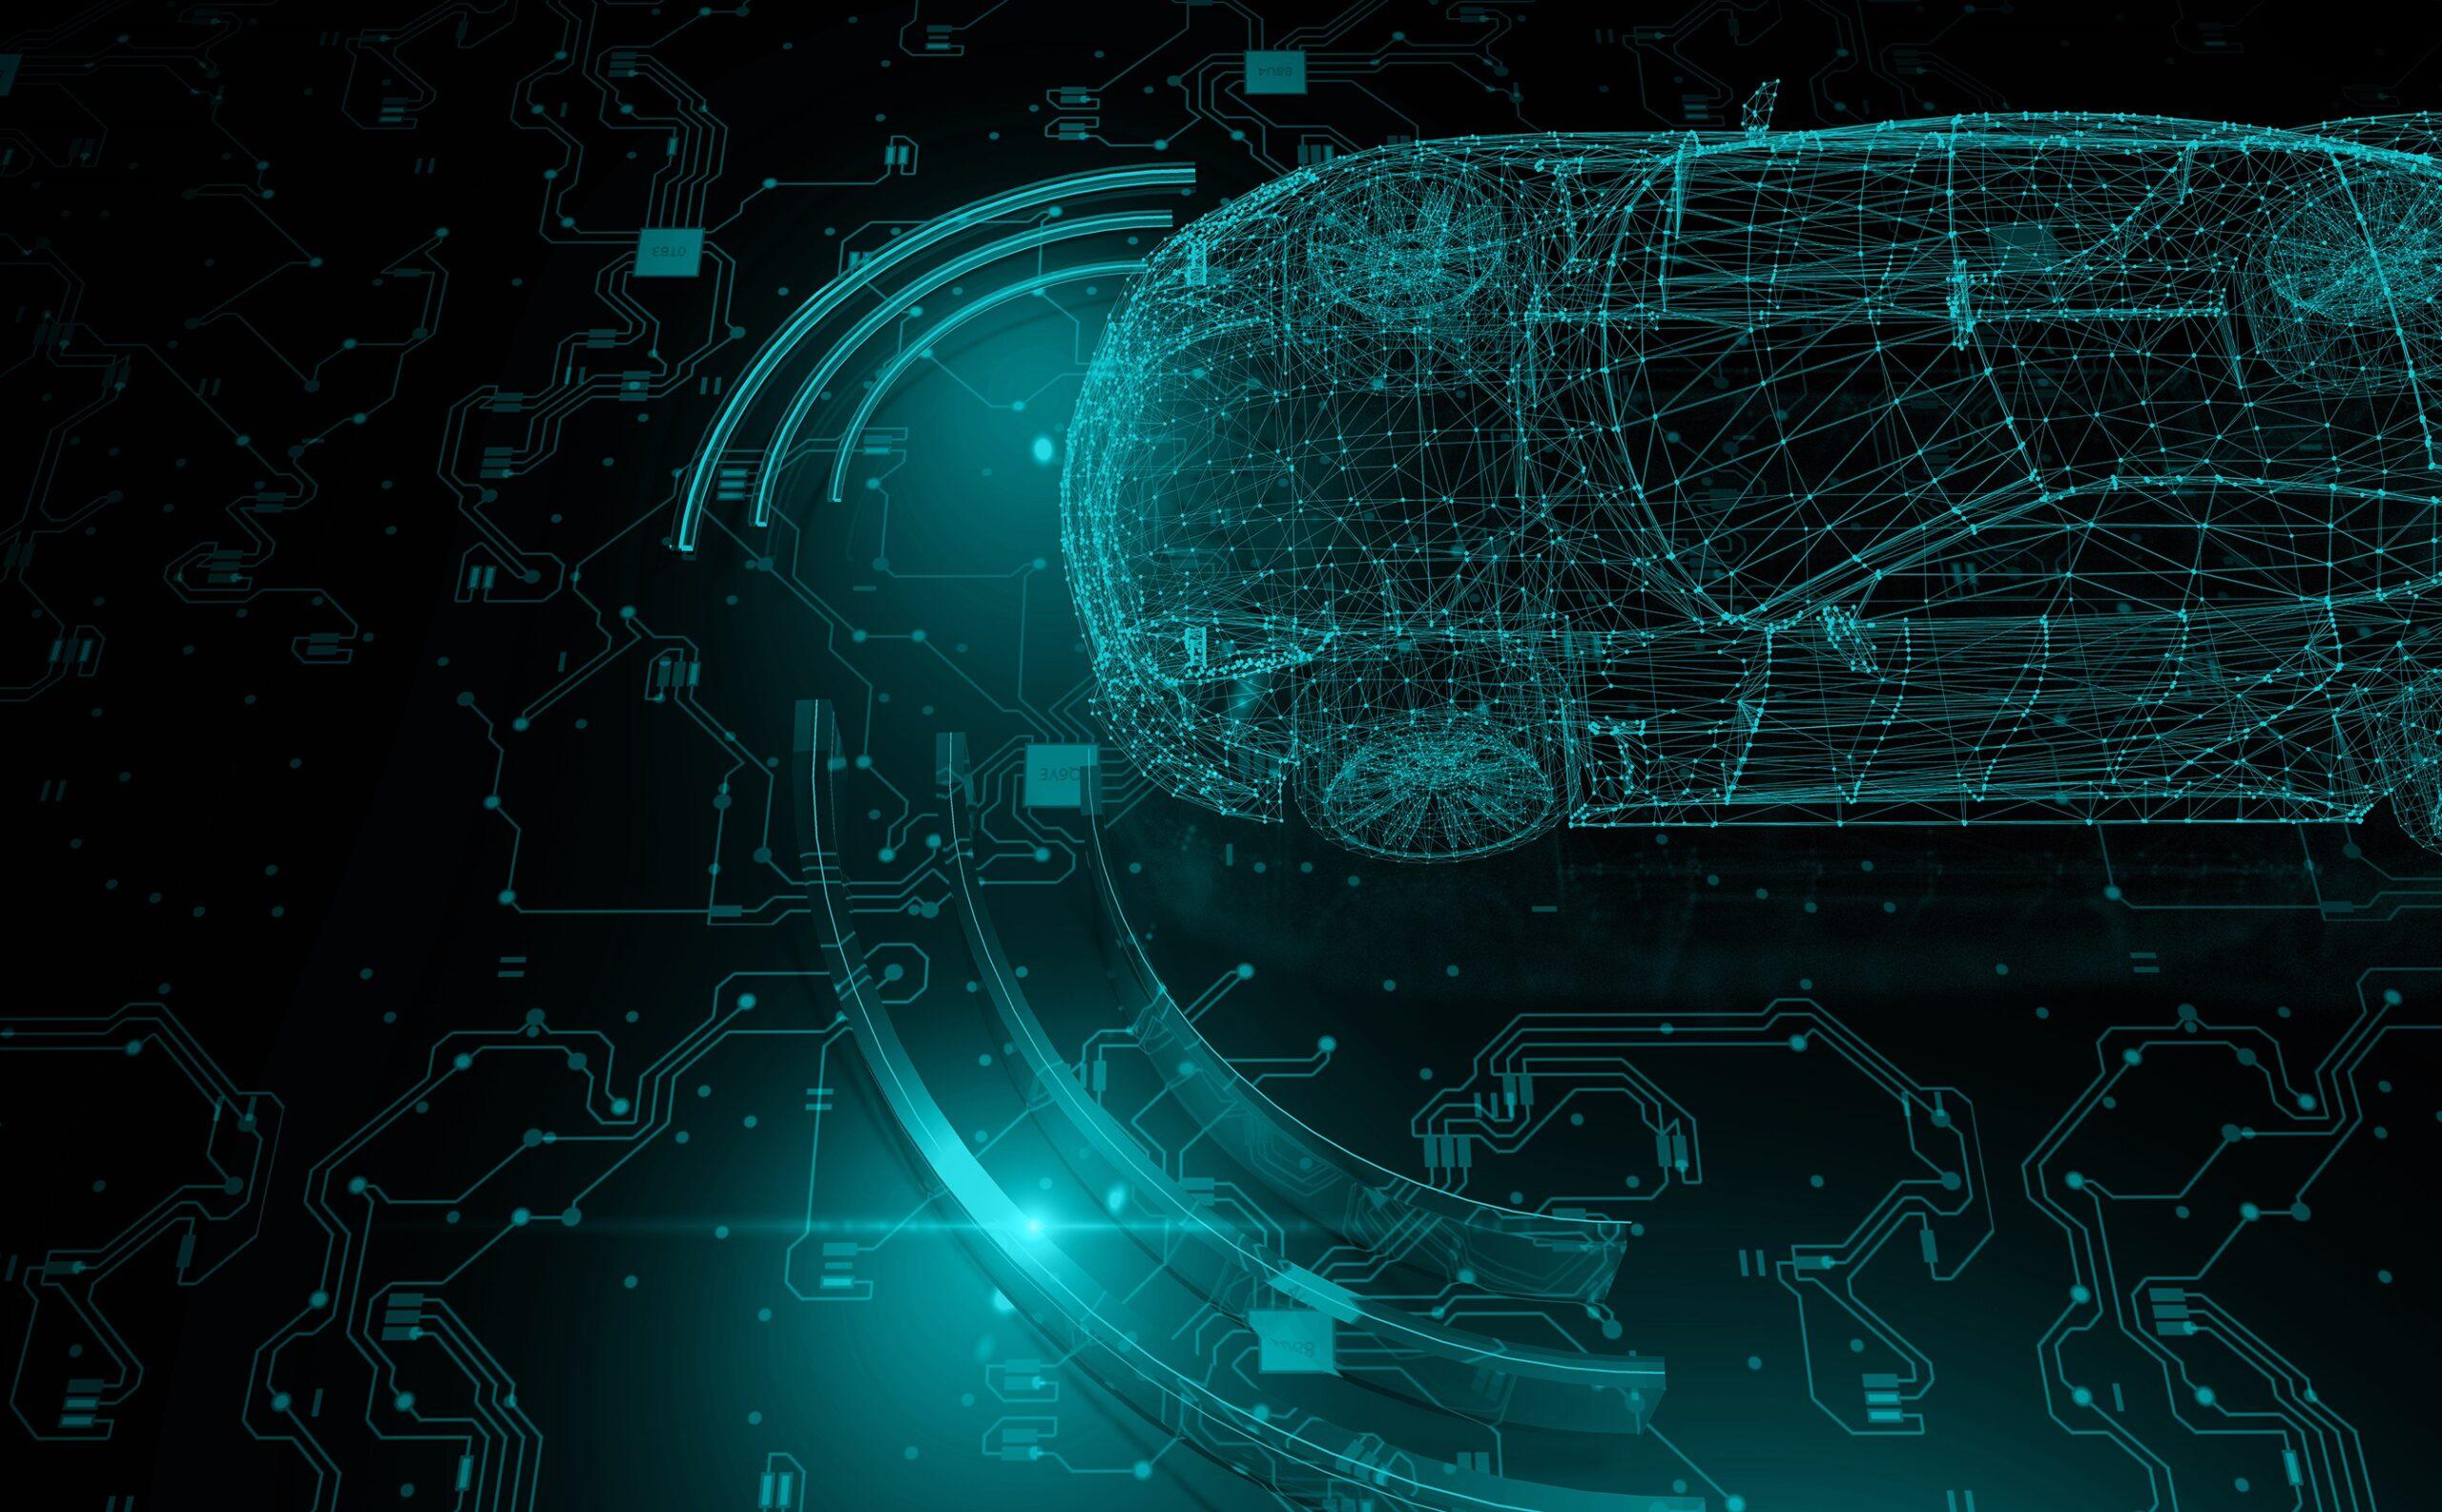 Workshop Safety, Research & Innovation @ The Autonomous